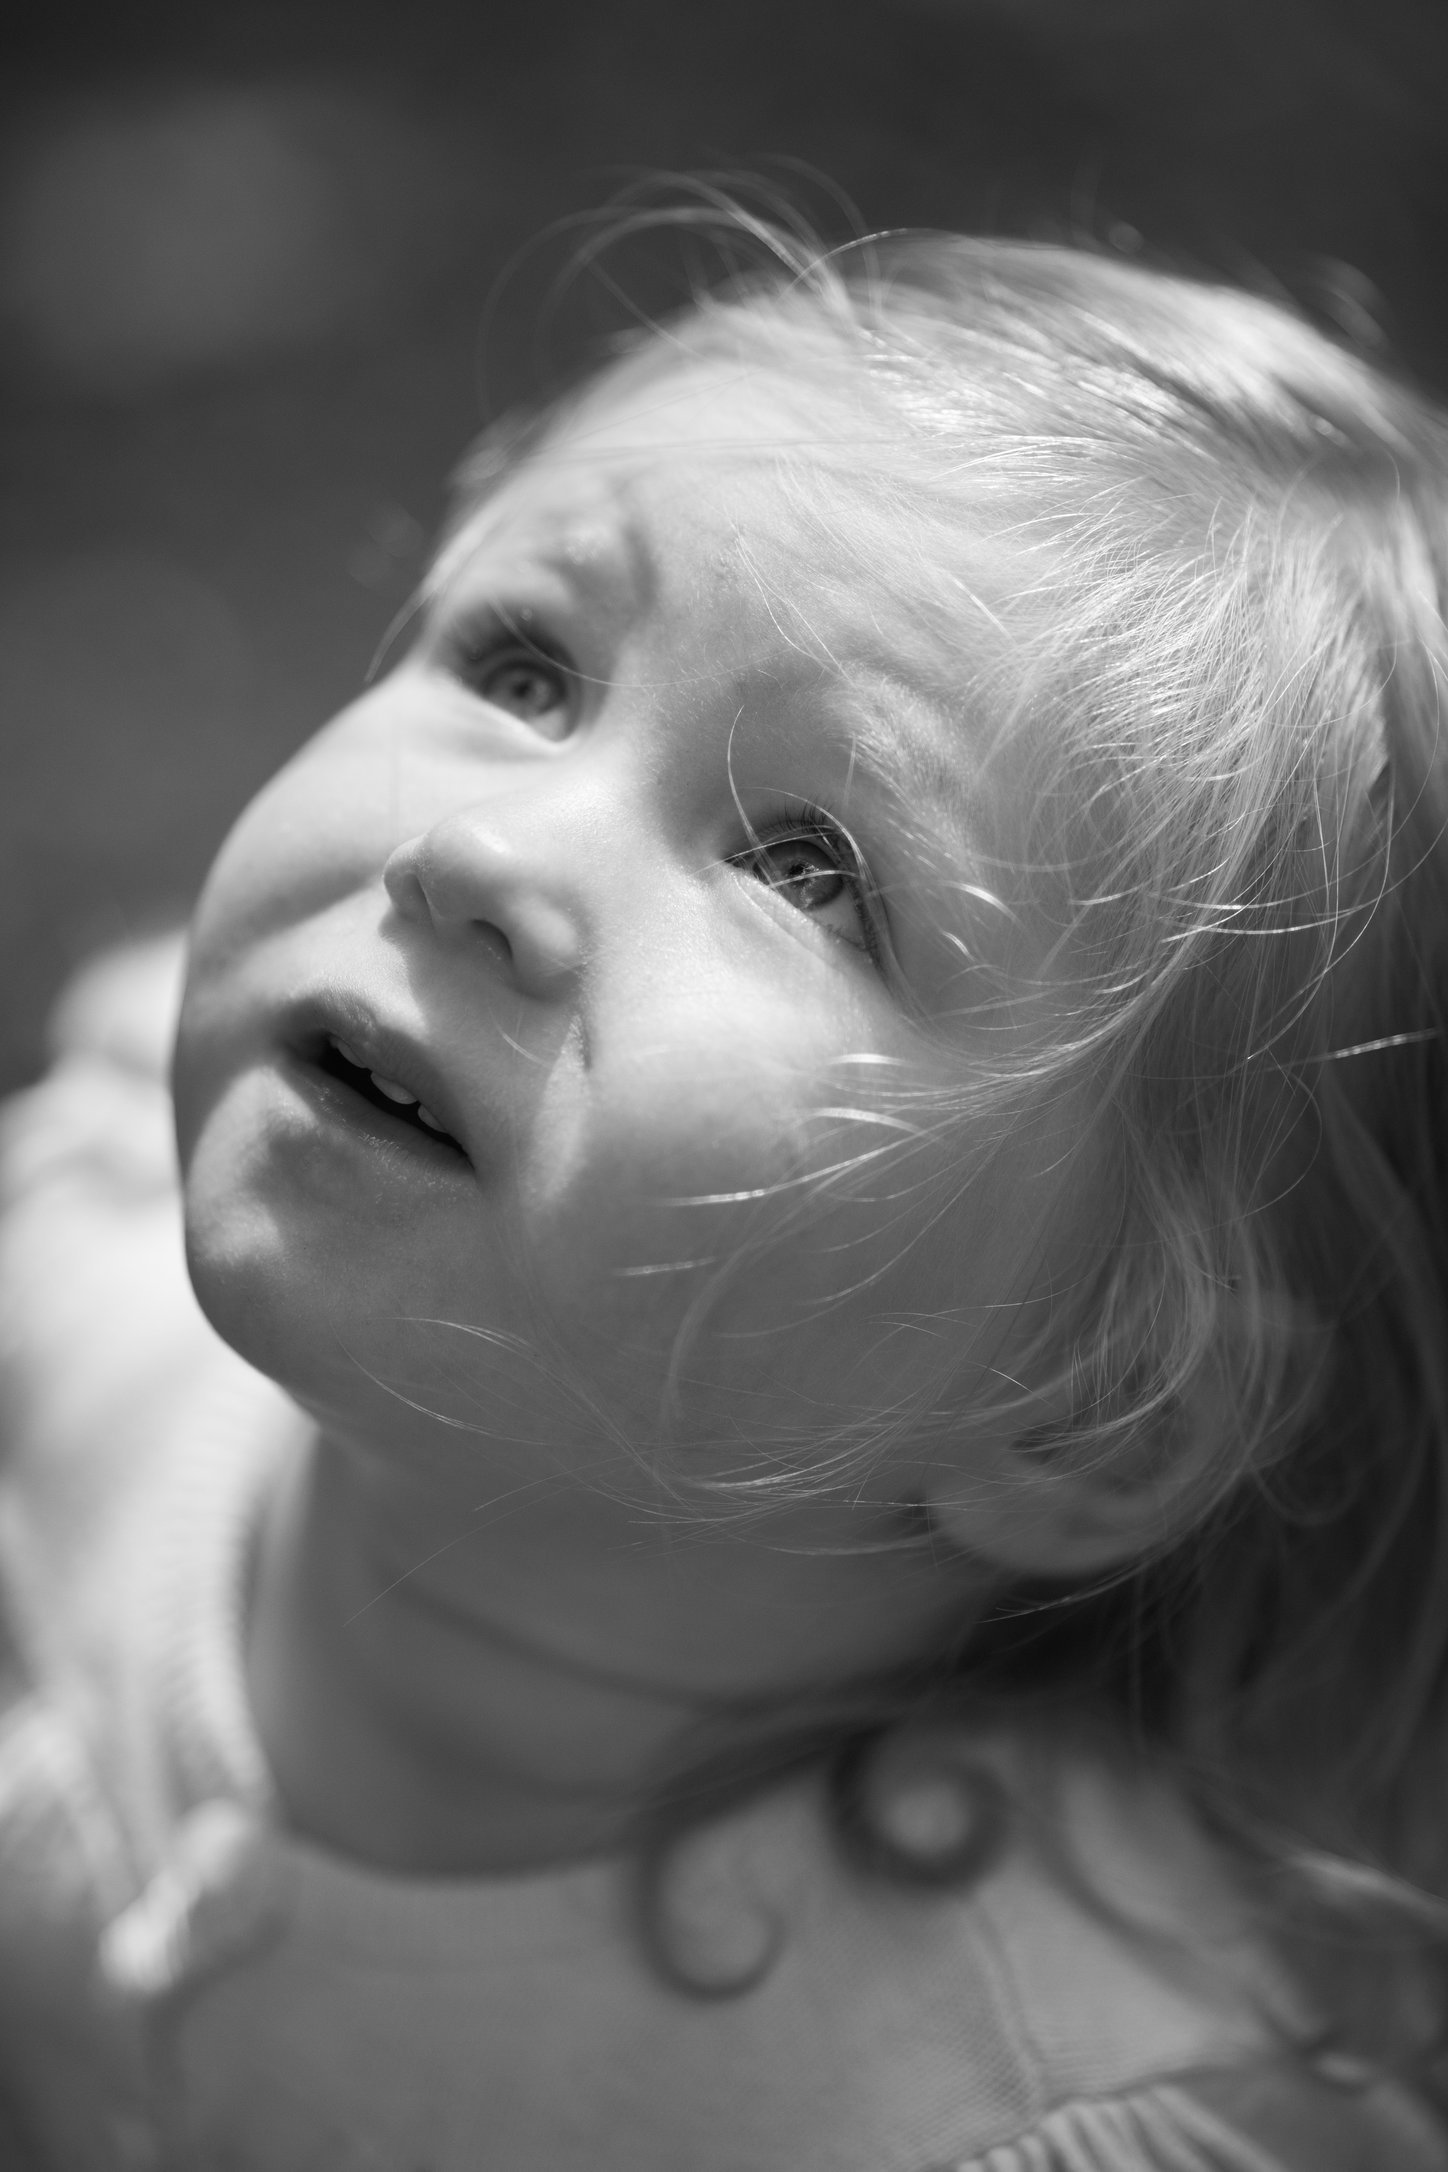 Portretfoto kind omhoog kijkend - © Janneke Walter, kinderfotograaf omgeving Utrecht